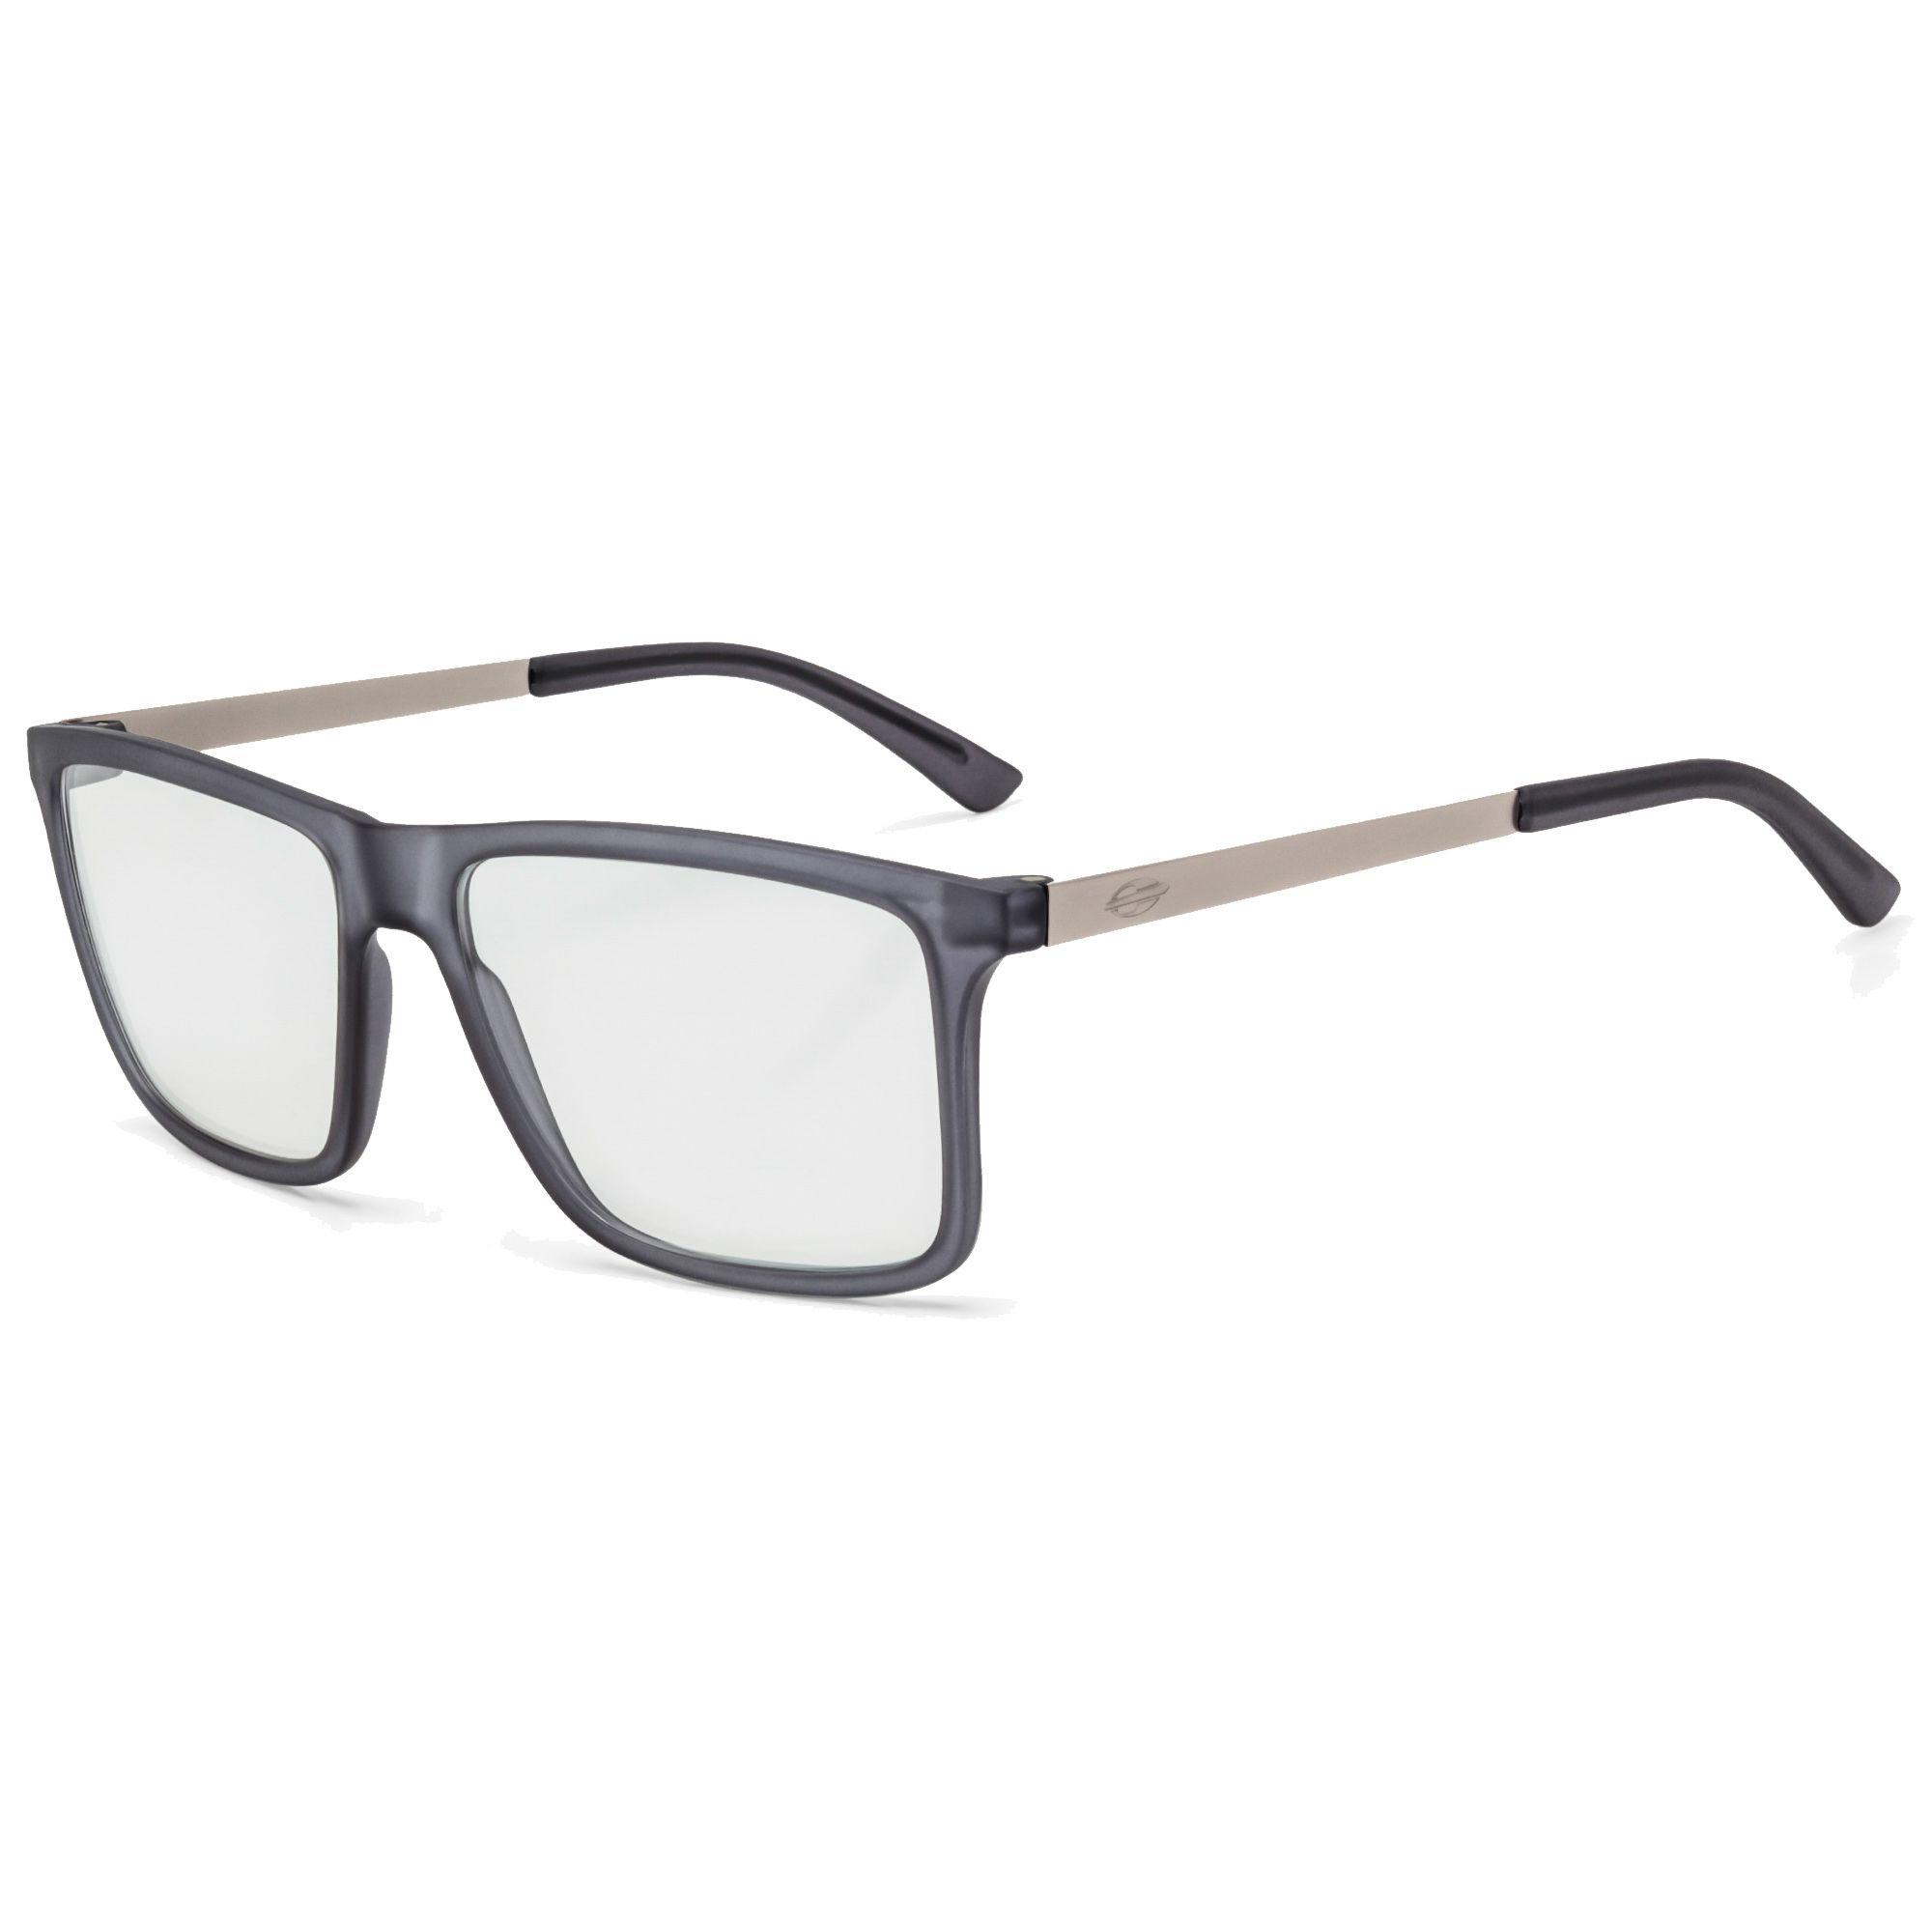 Óculos de Grau Unissex Mormaii Khapa M6045D5056